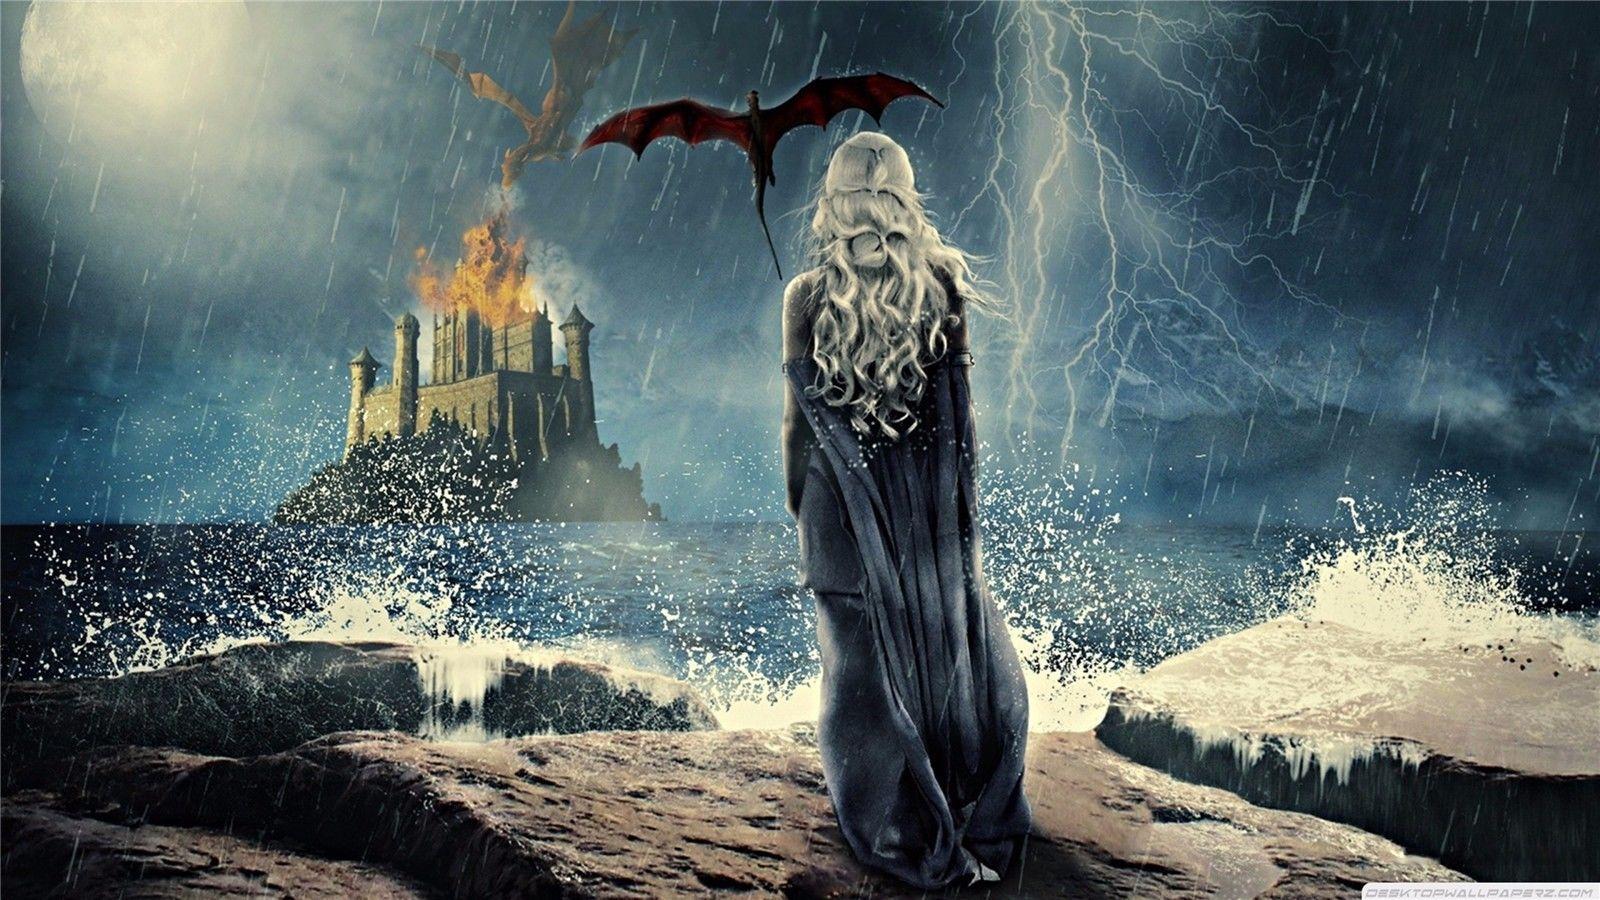 166804 New 2015 of Thrones TV Series Art Wall Decor Wall Pri